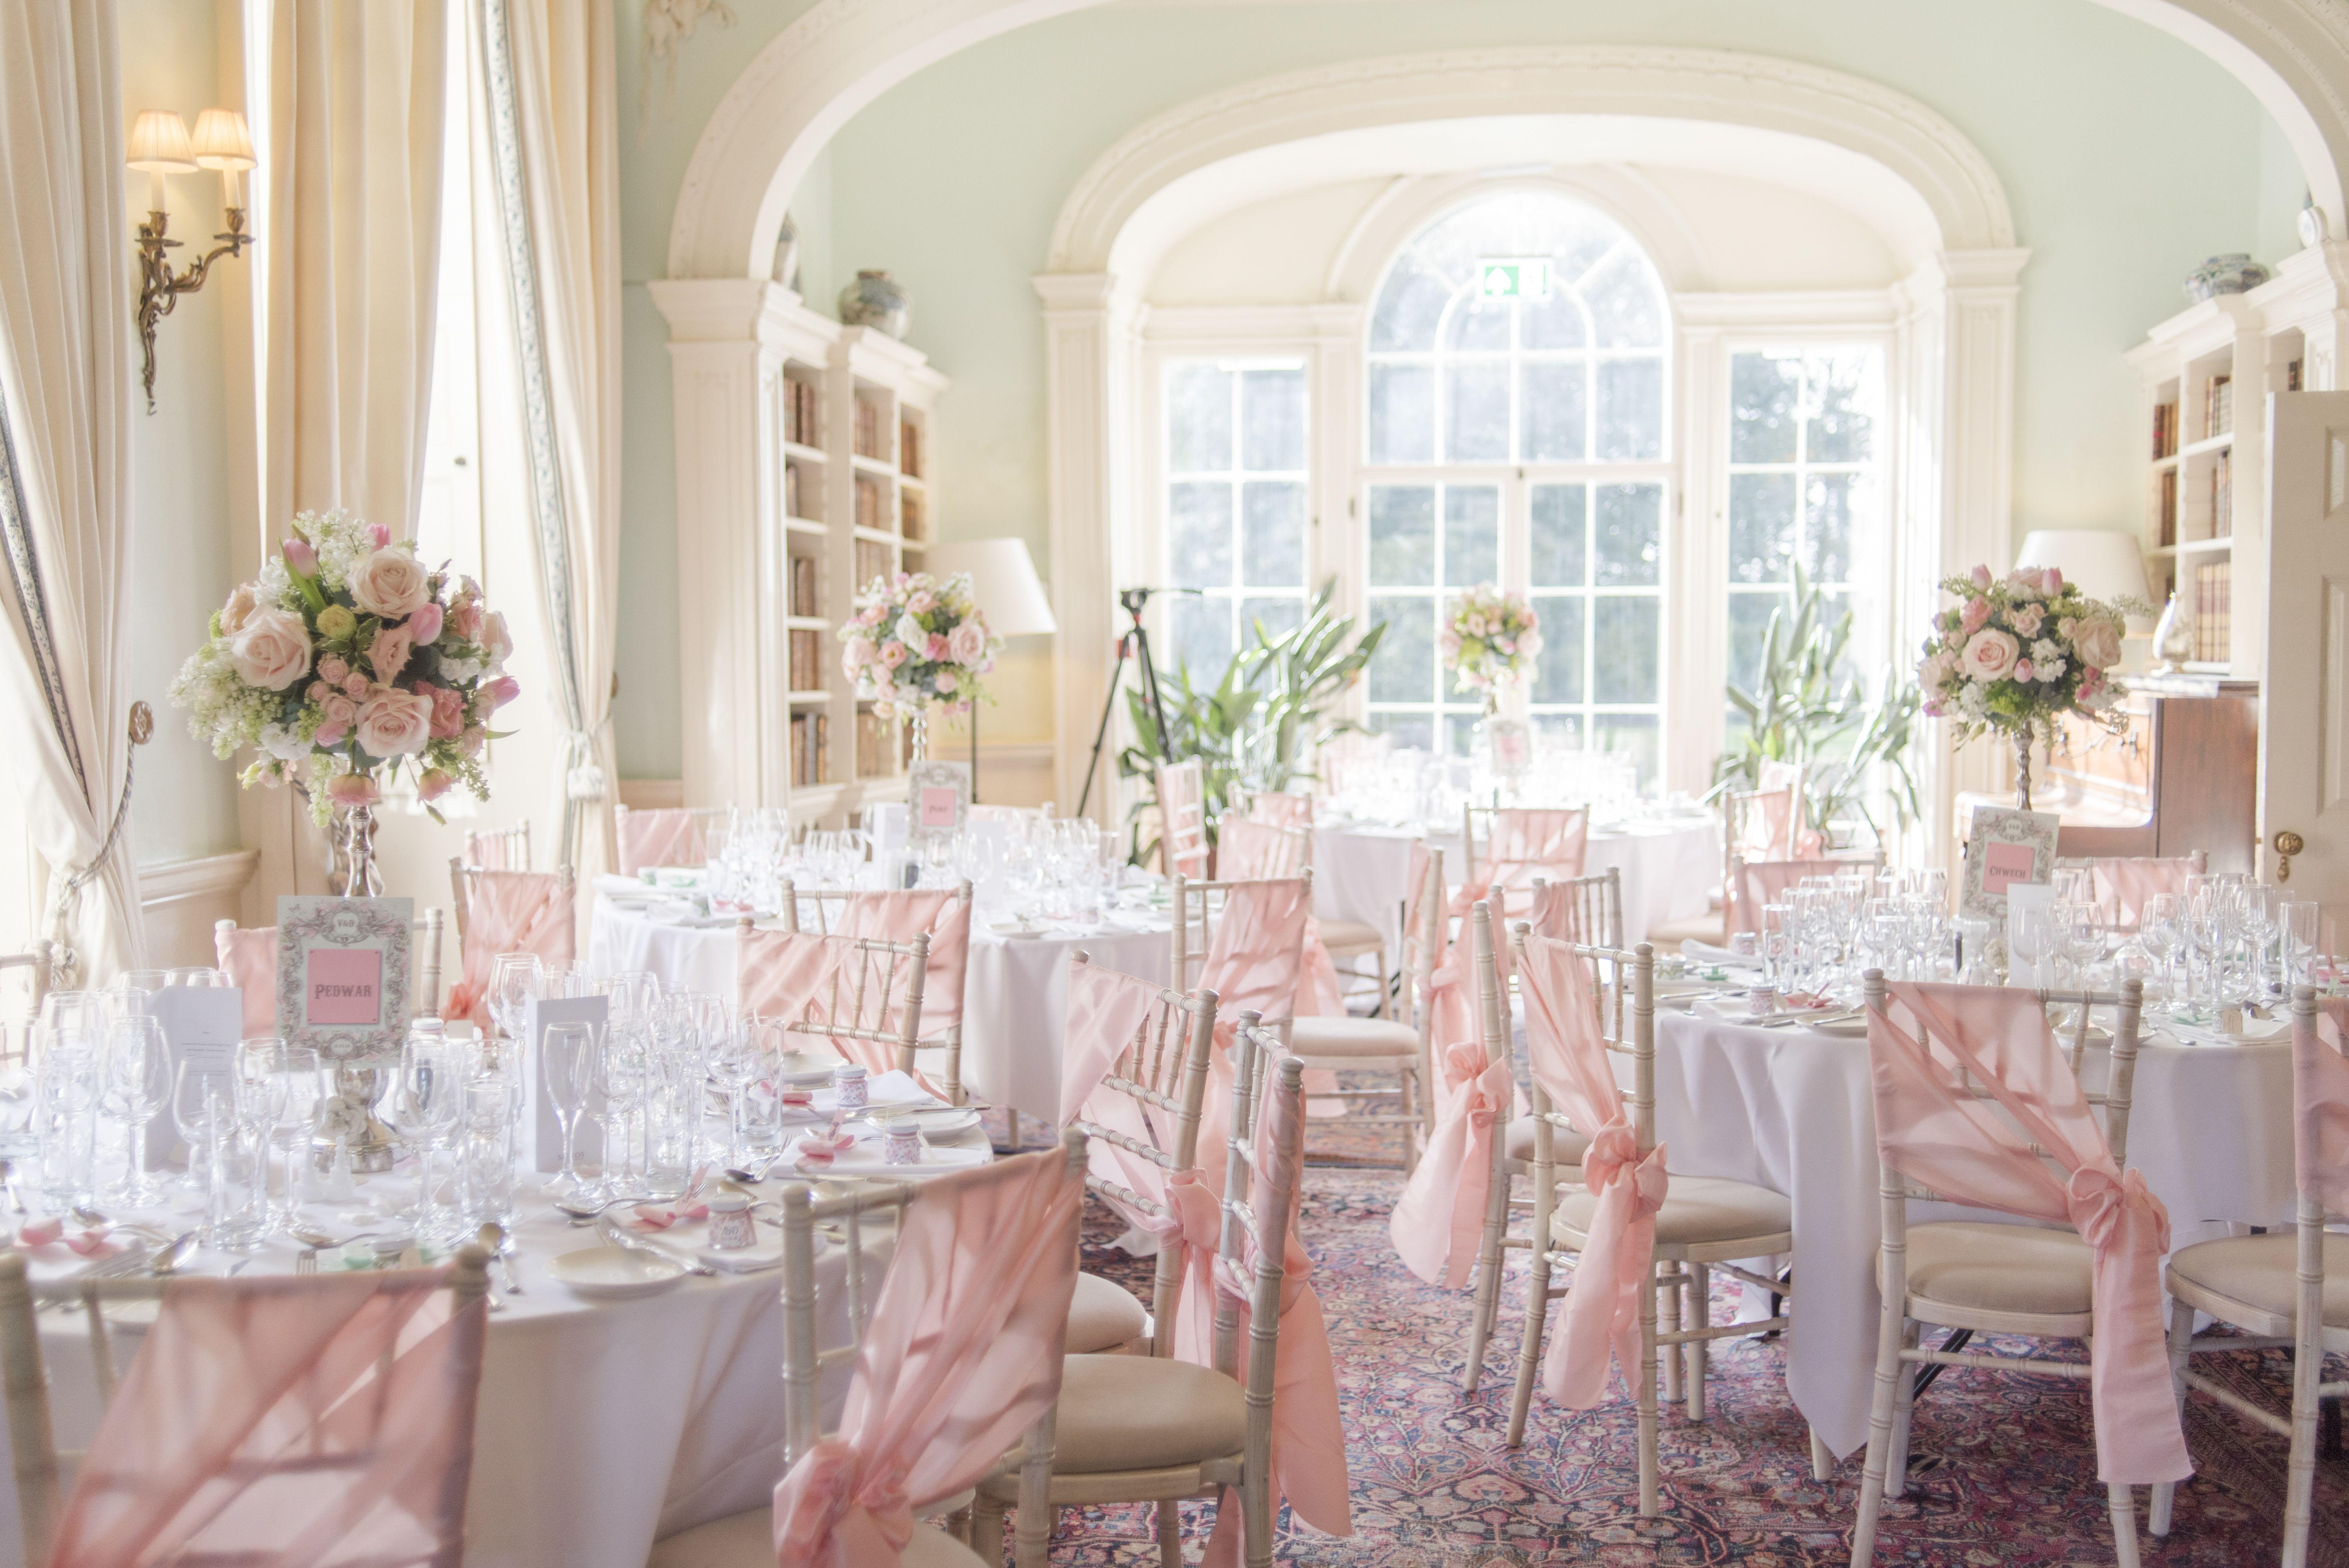 Fonmon Castle Wedding In 2020 Chiavari Chairs Chair Covers Wedding Wedding Chairs